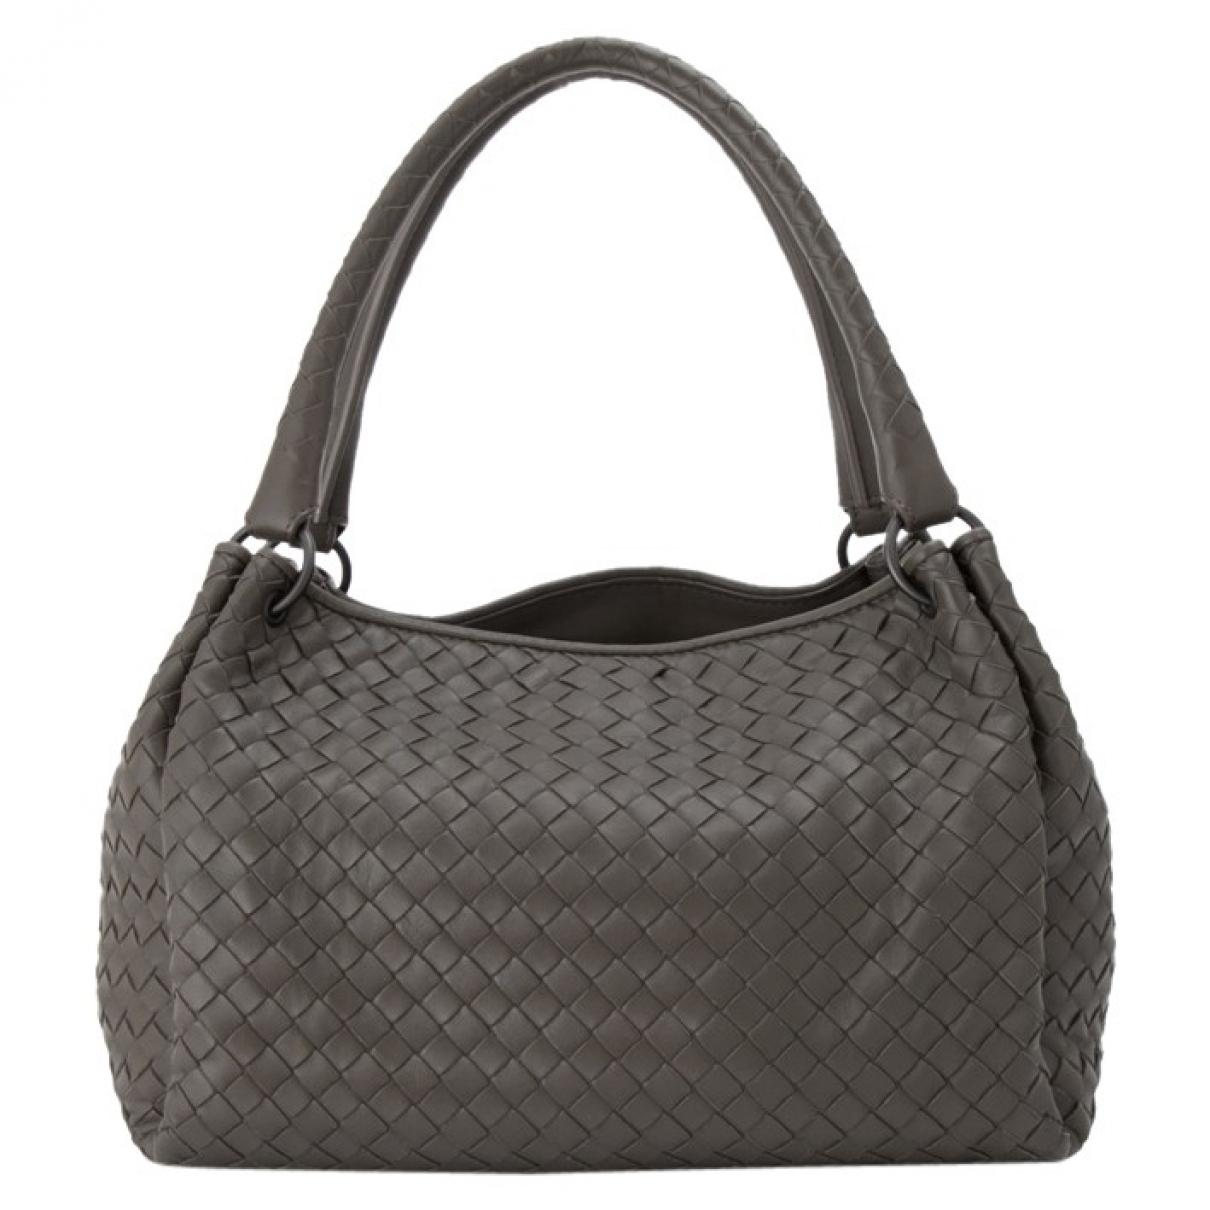 Bottega Veneta \N Grey Leather handbag for Women \N